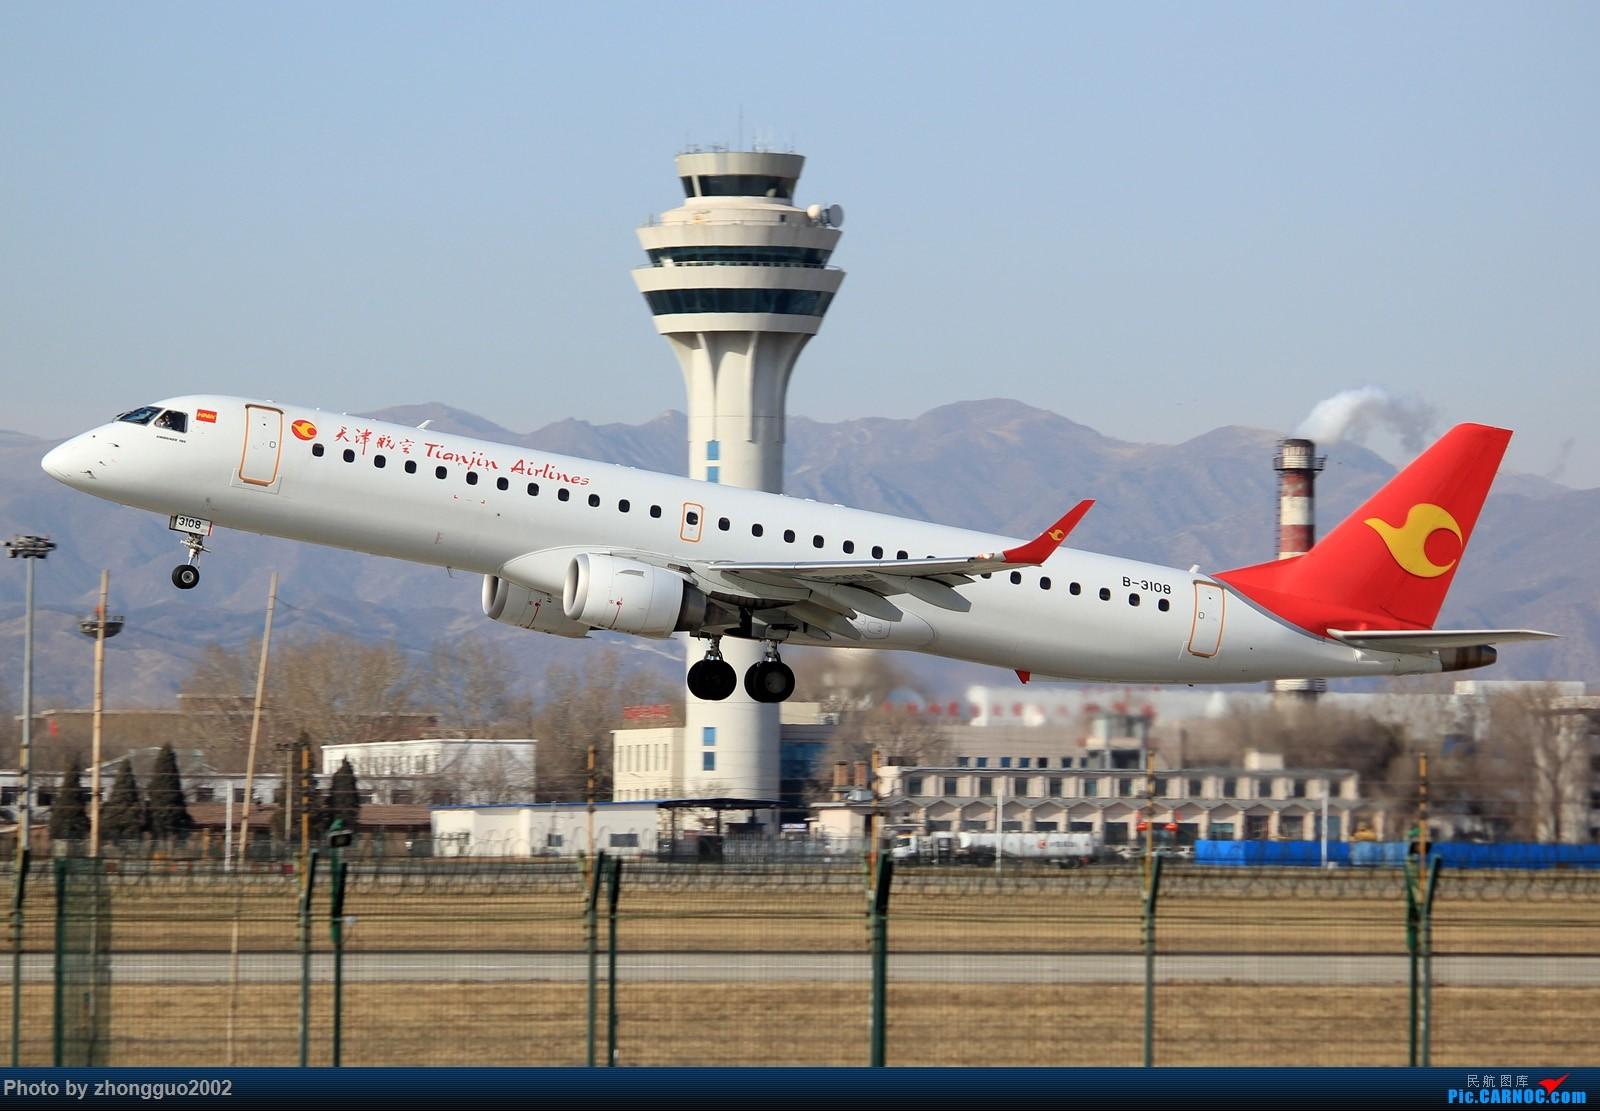 Re:[原创]久违---呼和浩特 EMBRAER E-195 B-3108 中国呼和浩特白塔国际机场